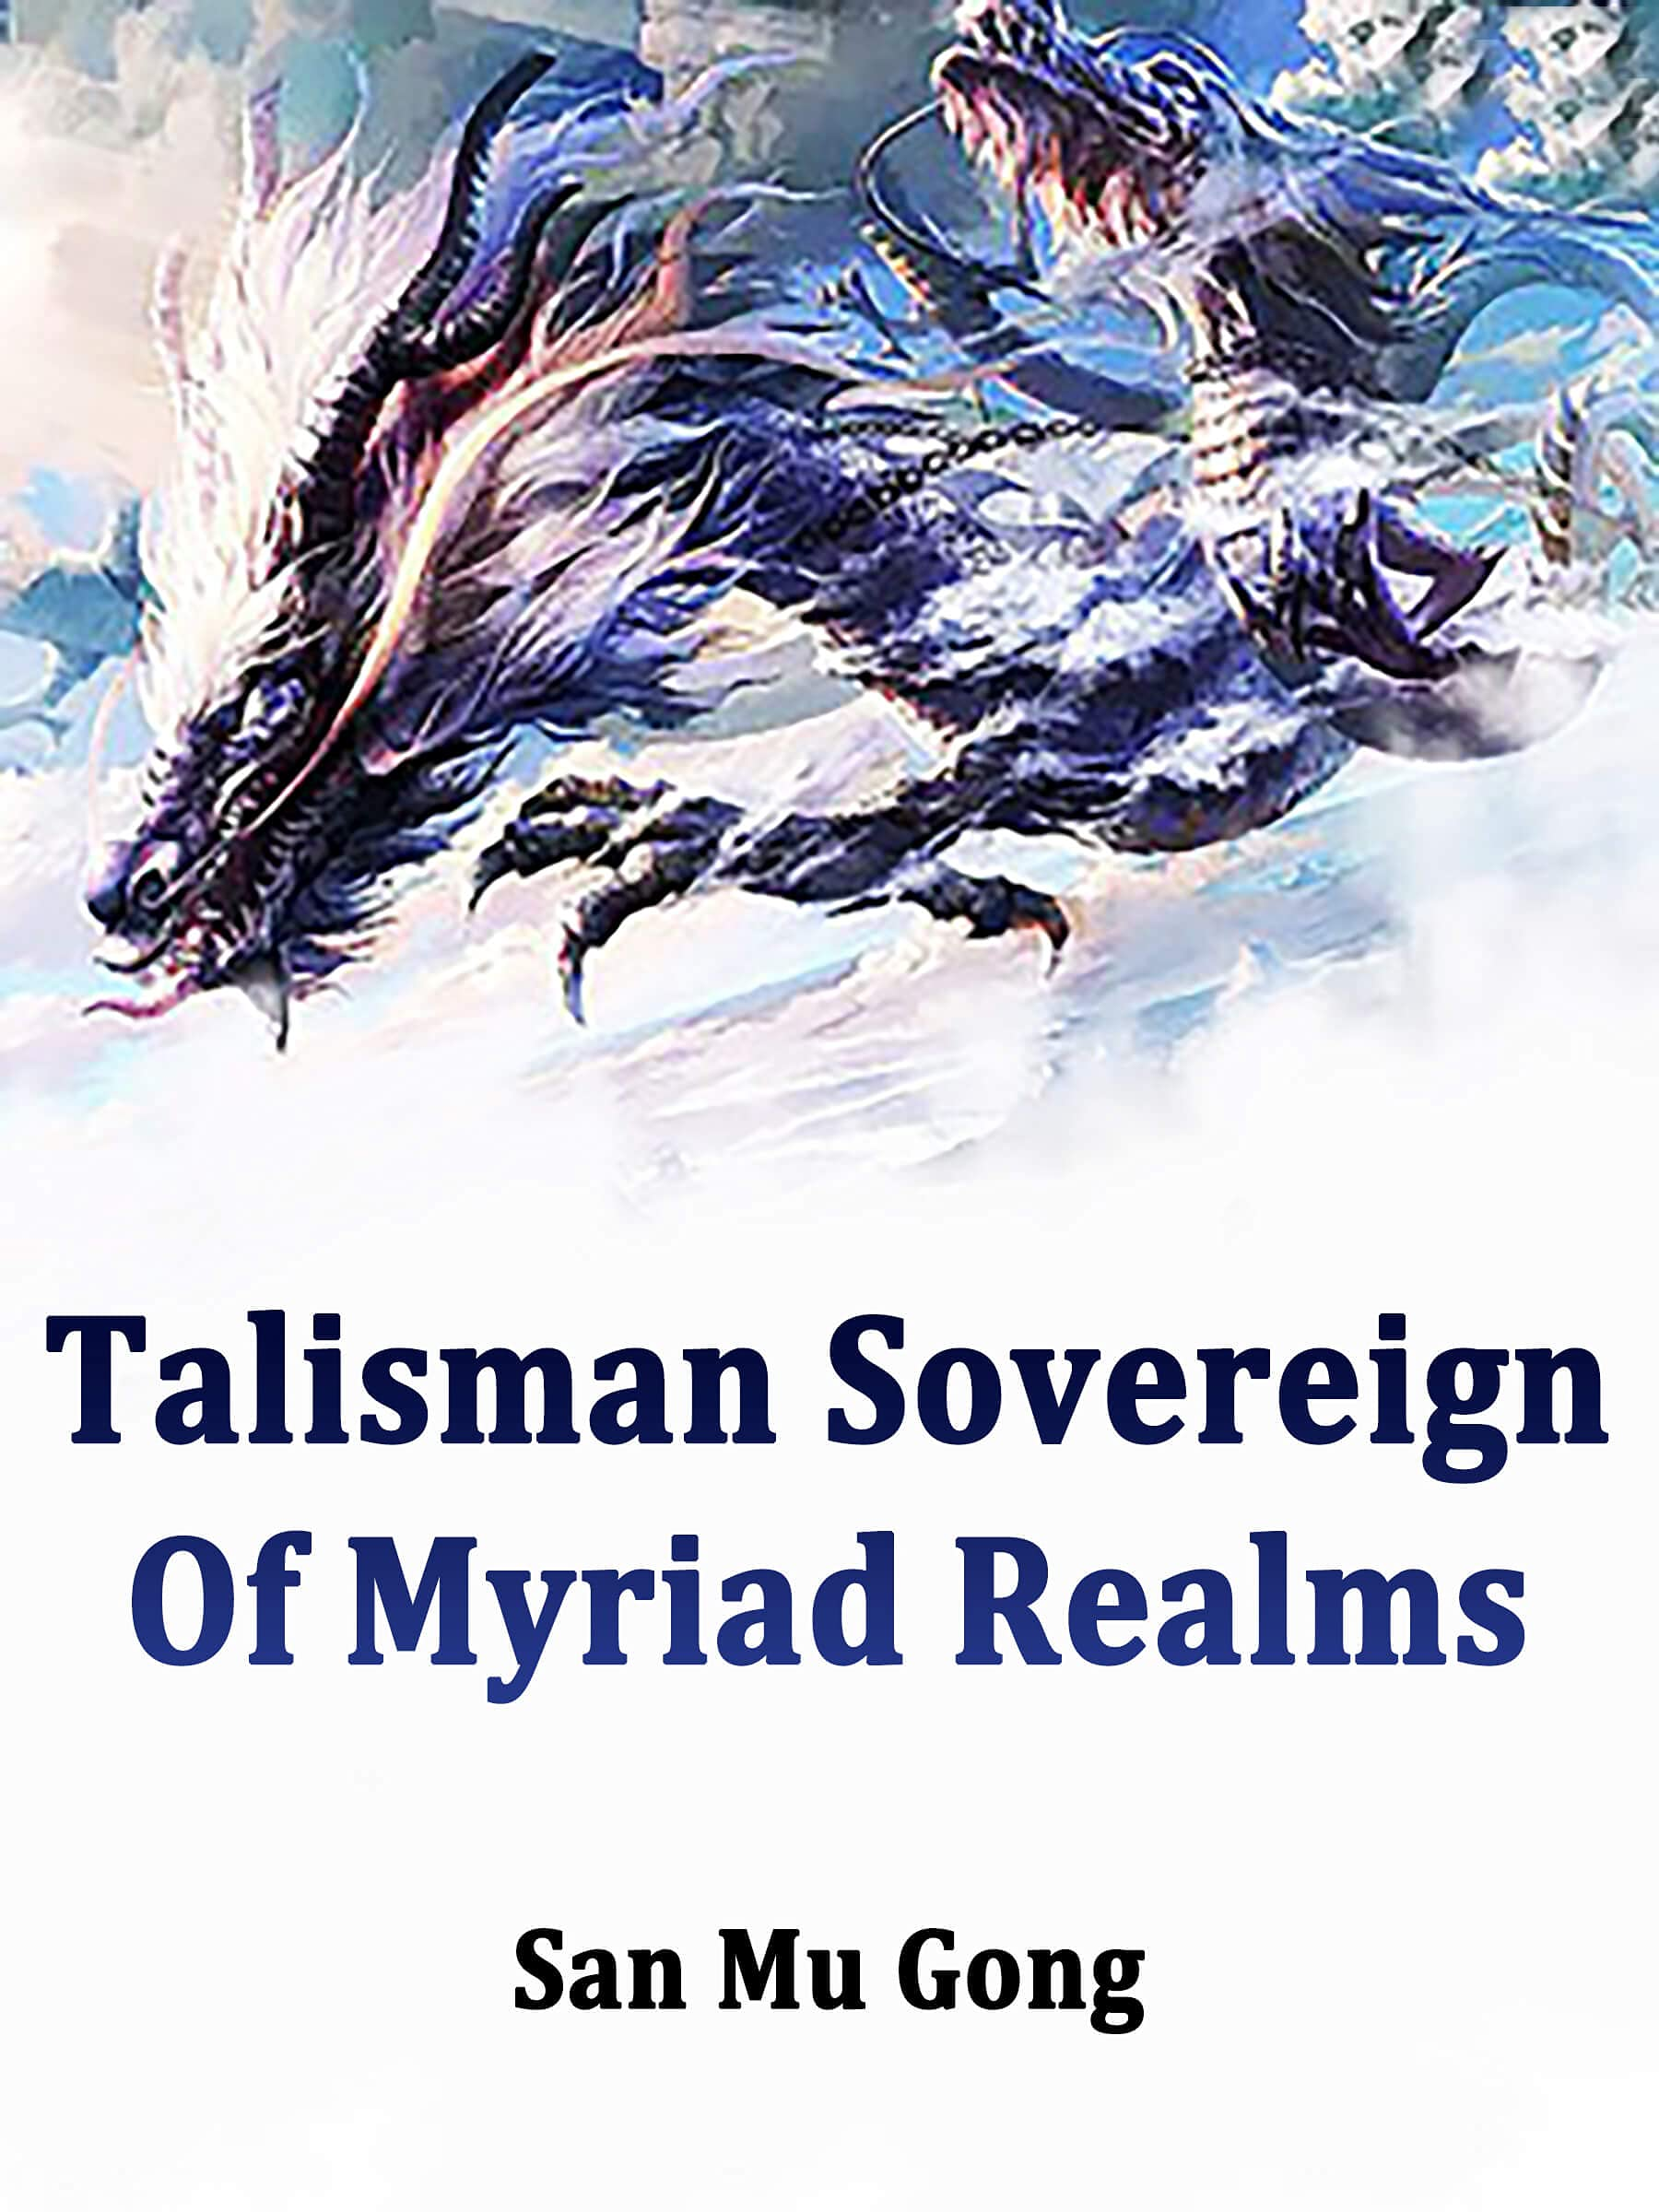 Talisman Sovereign Of Myriad Realms: The teenage superhero fiction and historical fantasy novels ( action adventure, harem for men kindle, cultivation progression ) Book 3